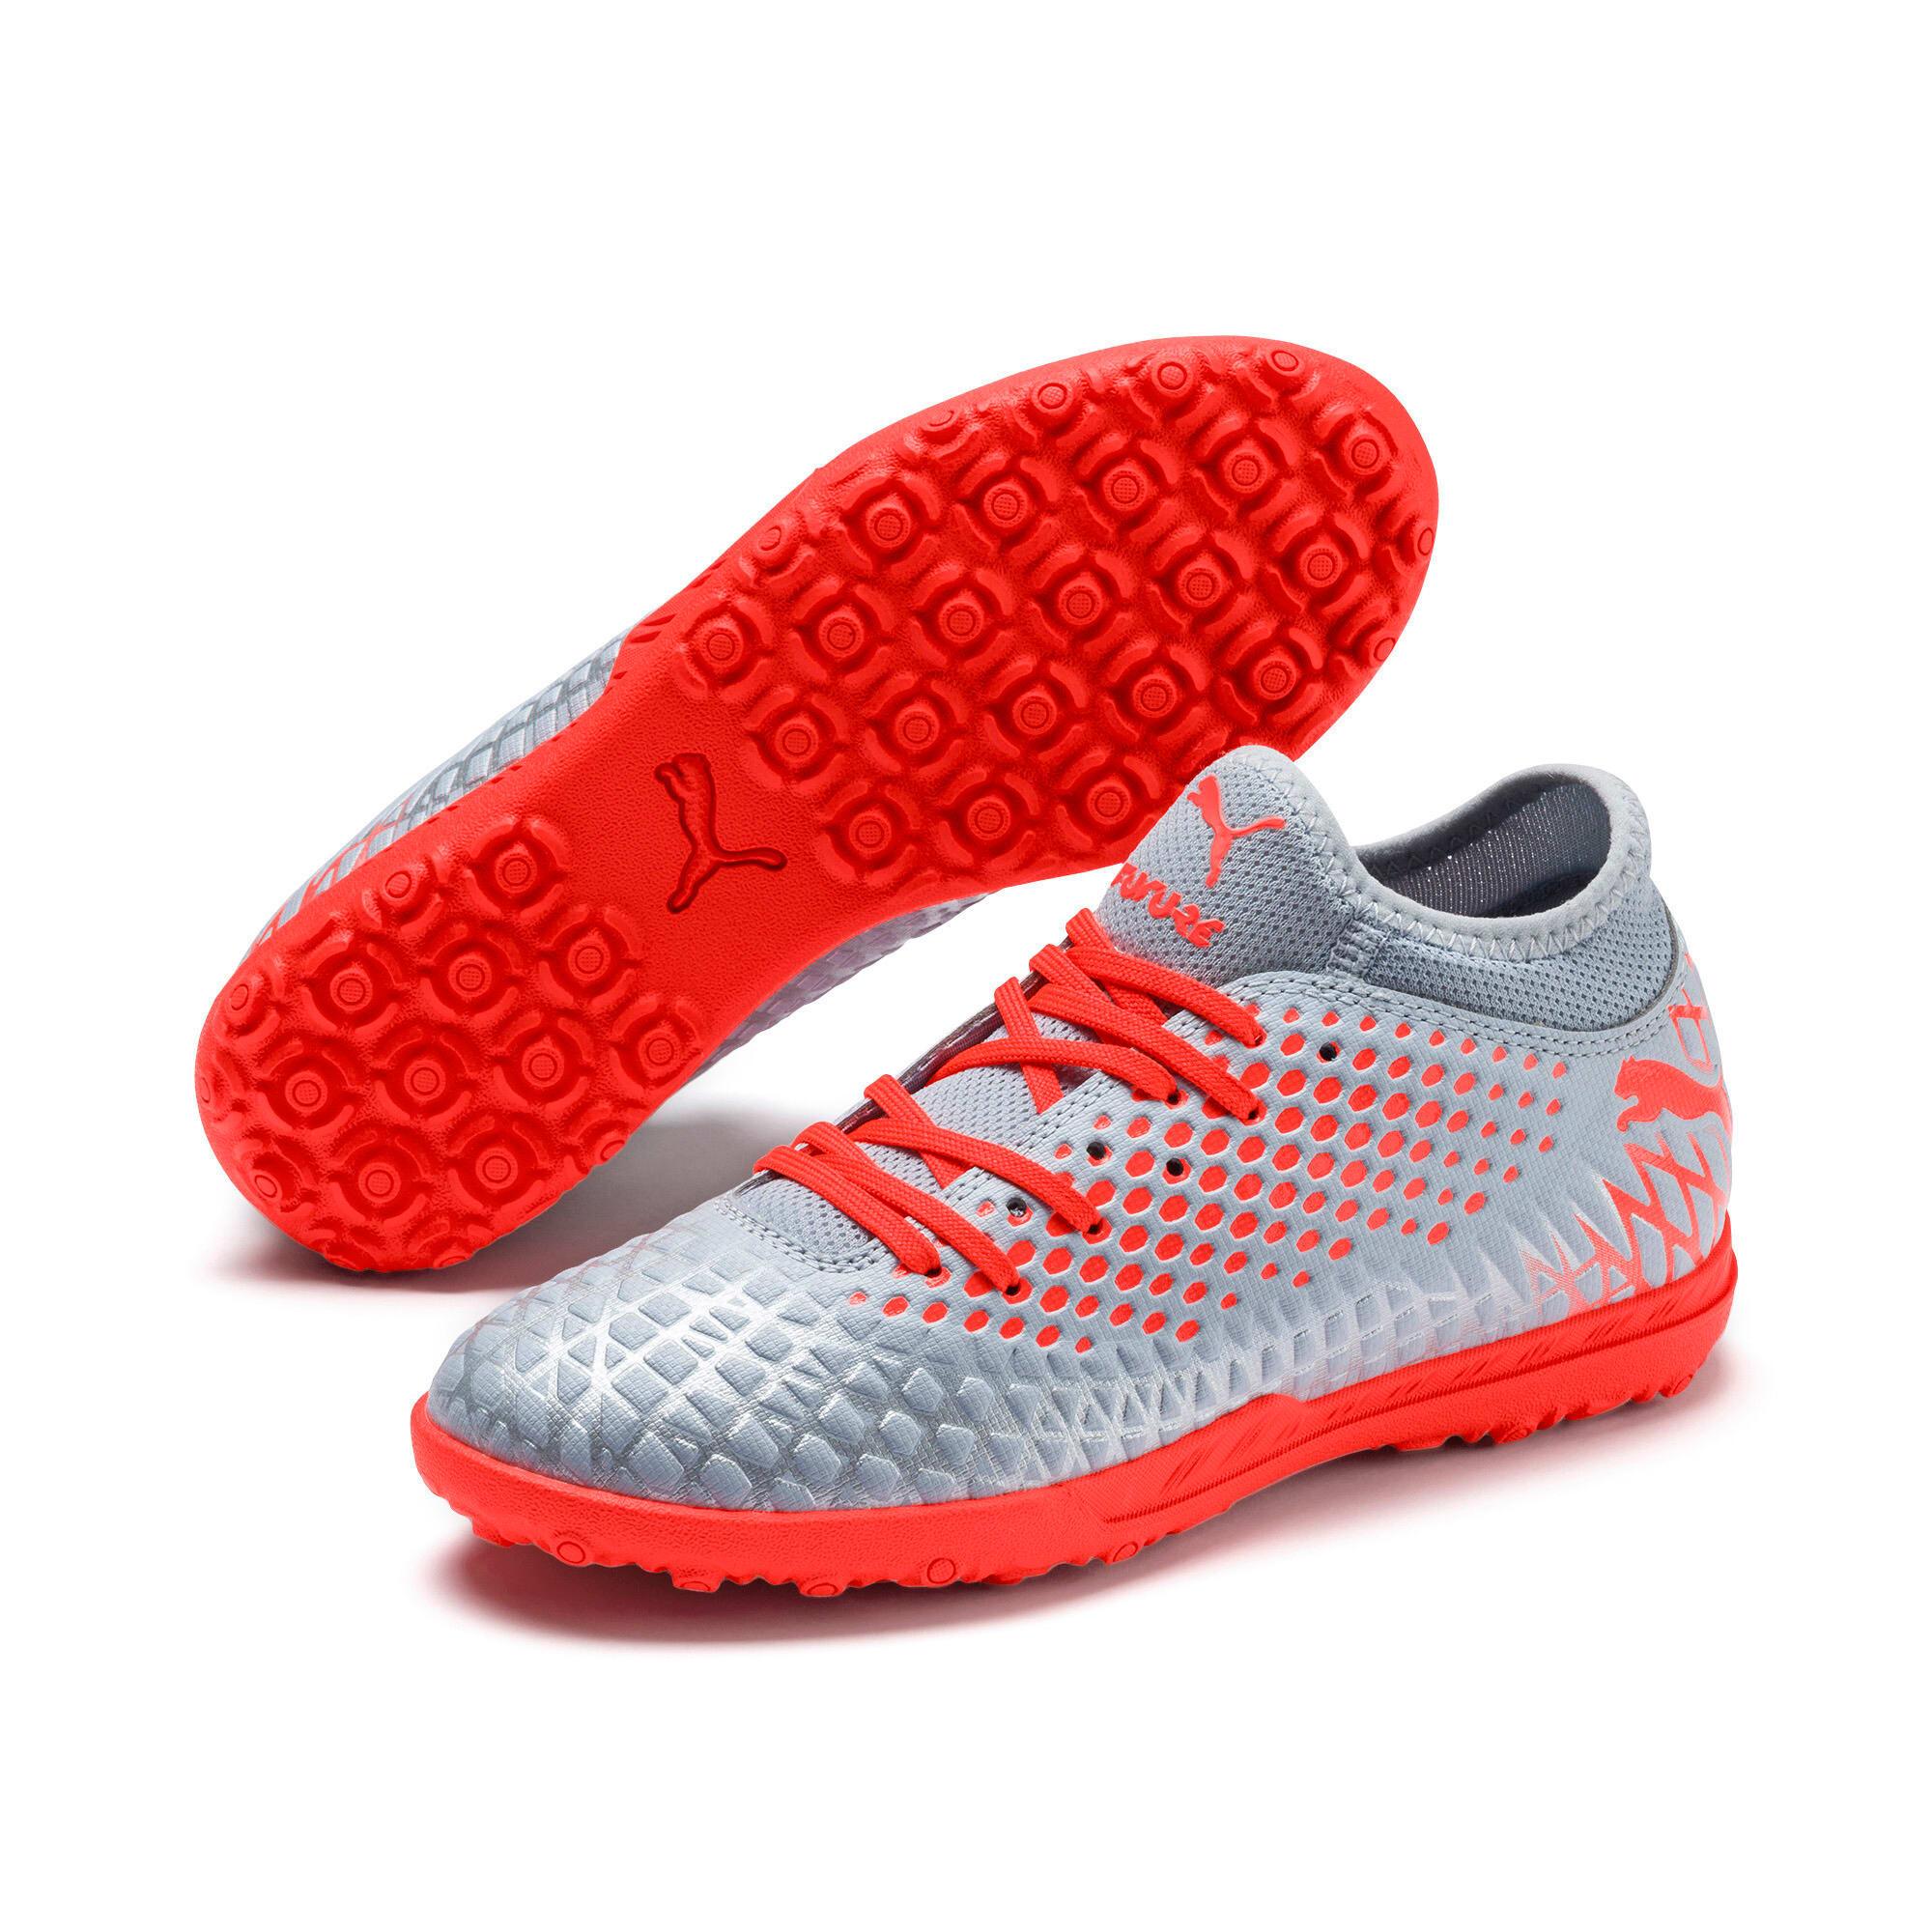 Thumbnail 2 of FUTURE 4.4 TT Soccer Shoes JR, Glacial Blue-Nrgy Red, medium